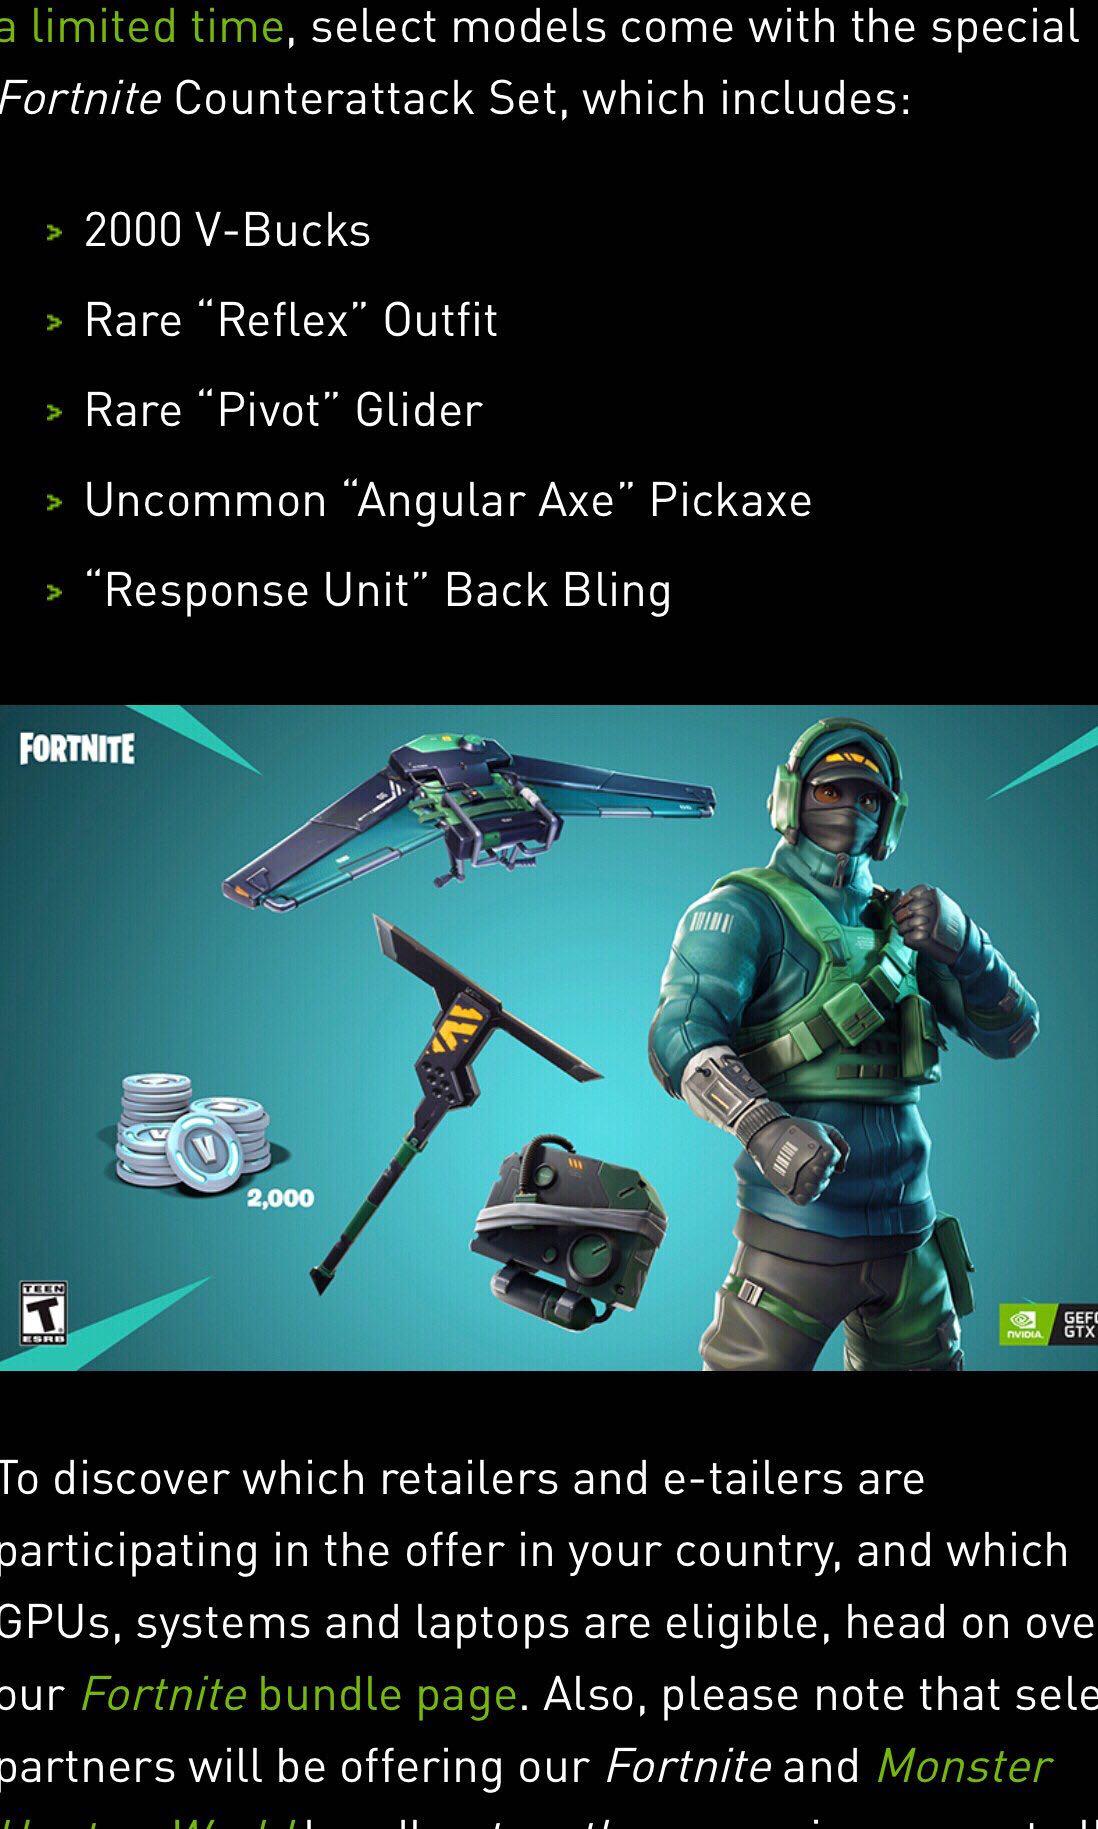 Nvidia Geforce Fortnite Counterattack Set Game Code Fast